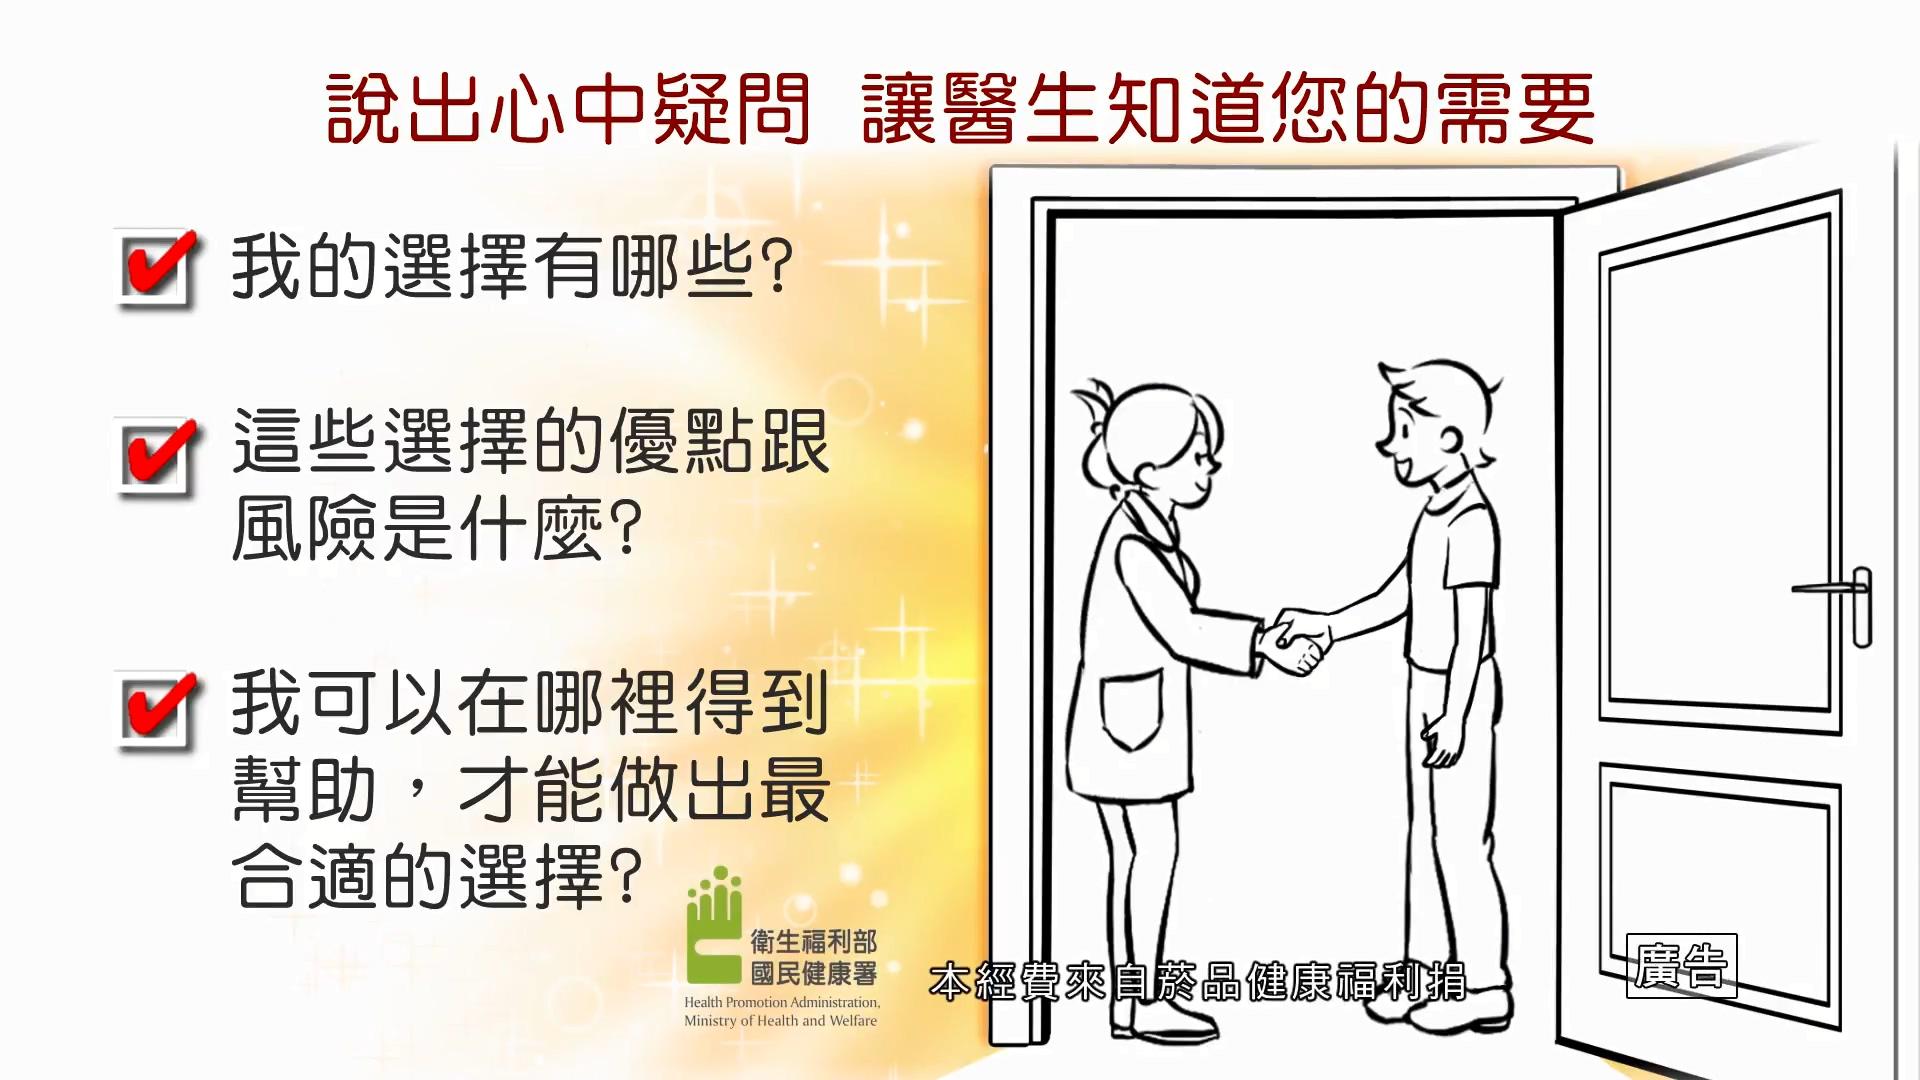 SDM 就醫3問_宣導字卡(台語)